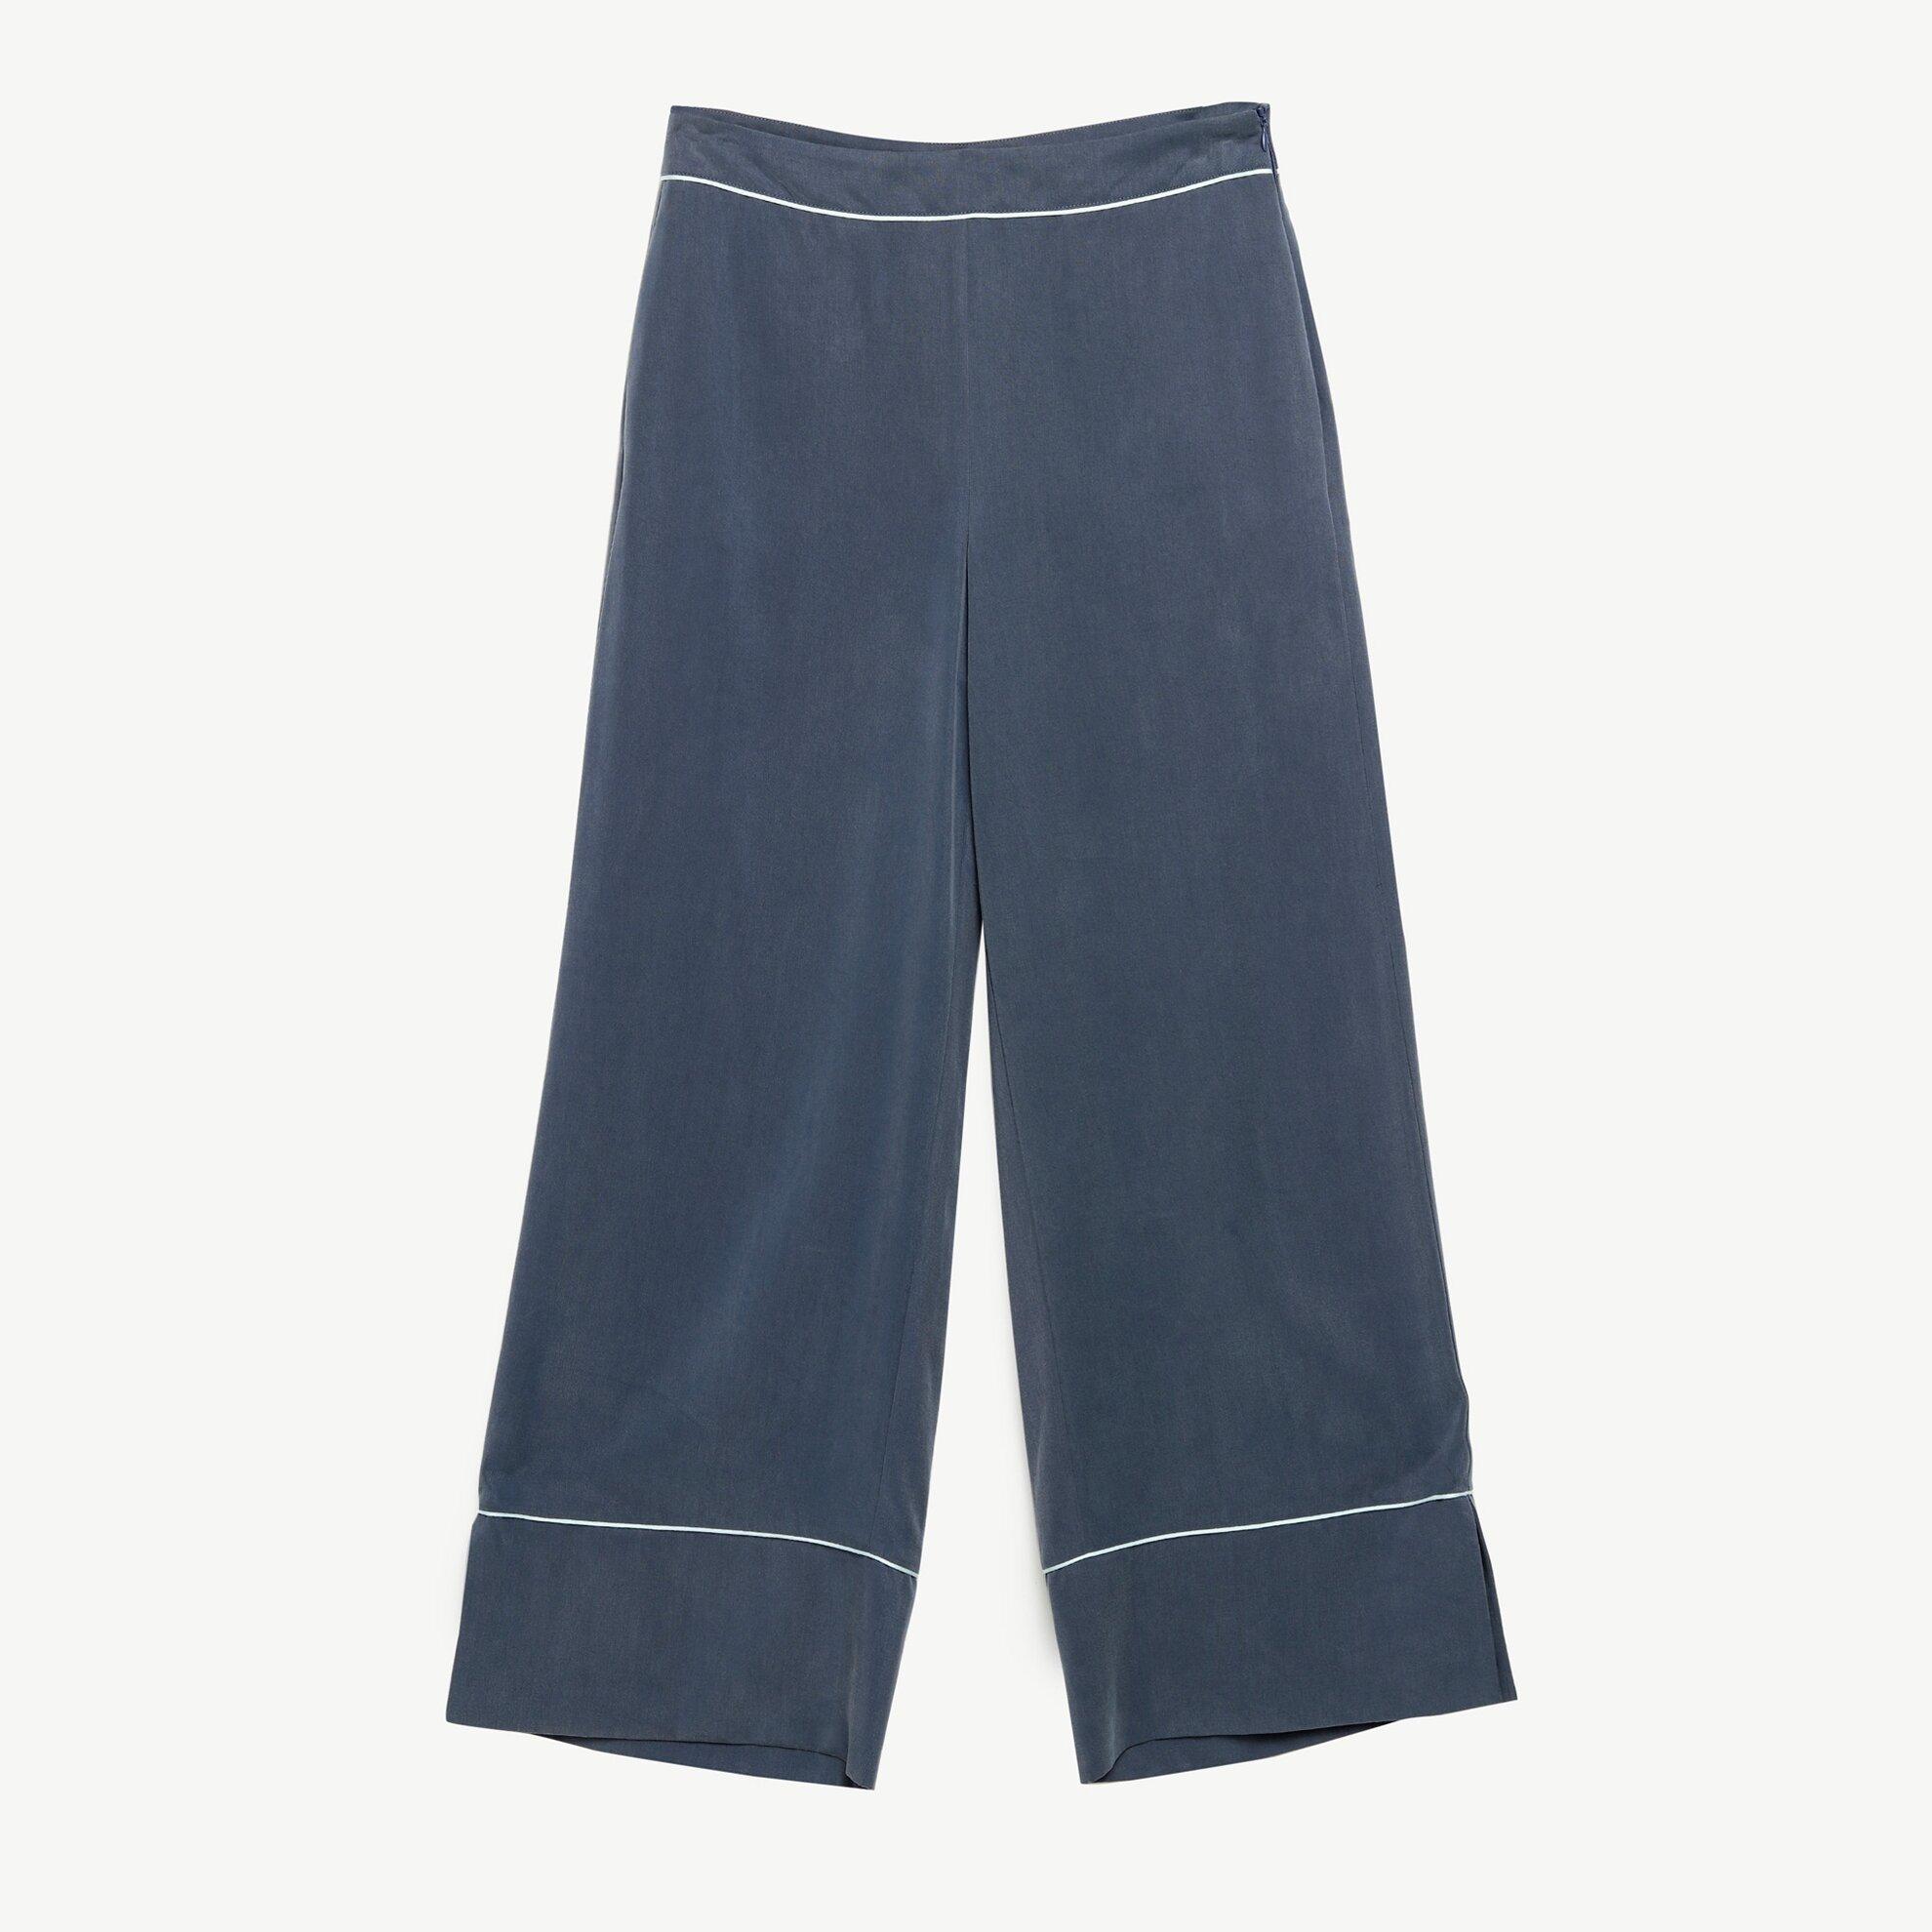 Biye Detalı Pantolon